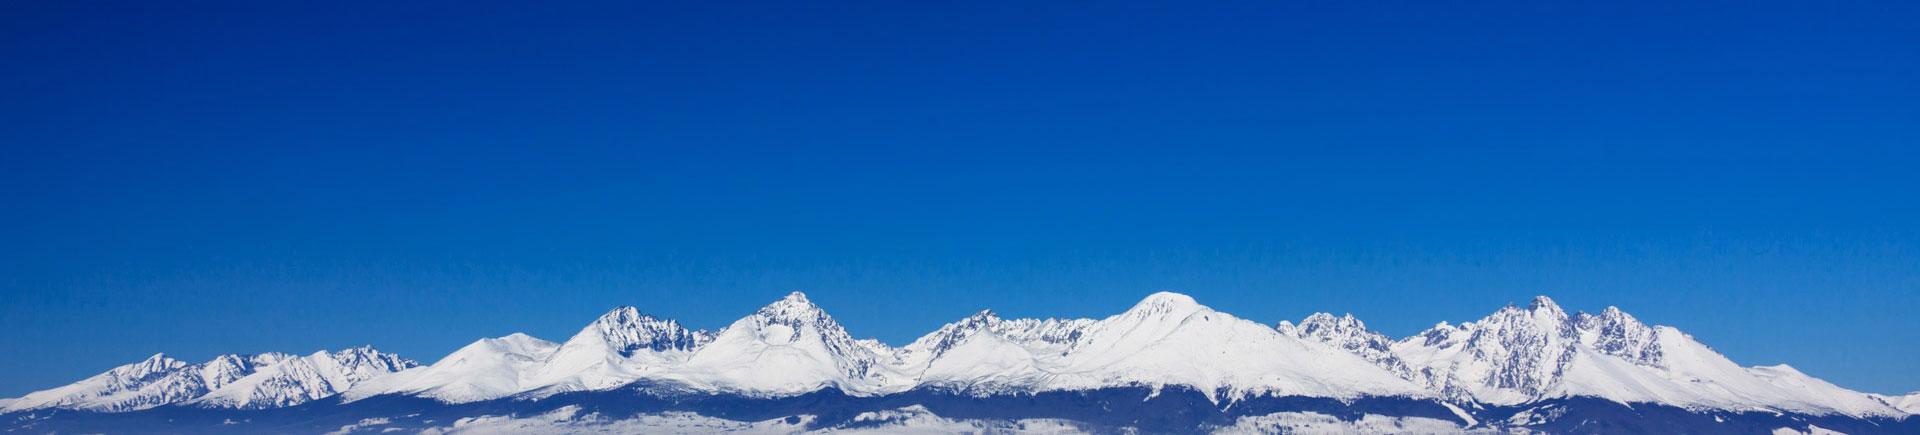 sylwester góry, tatry, zima